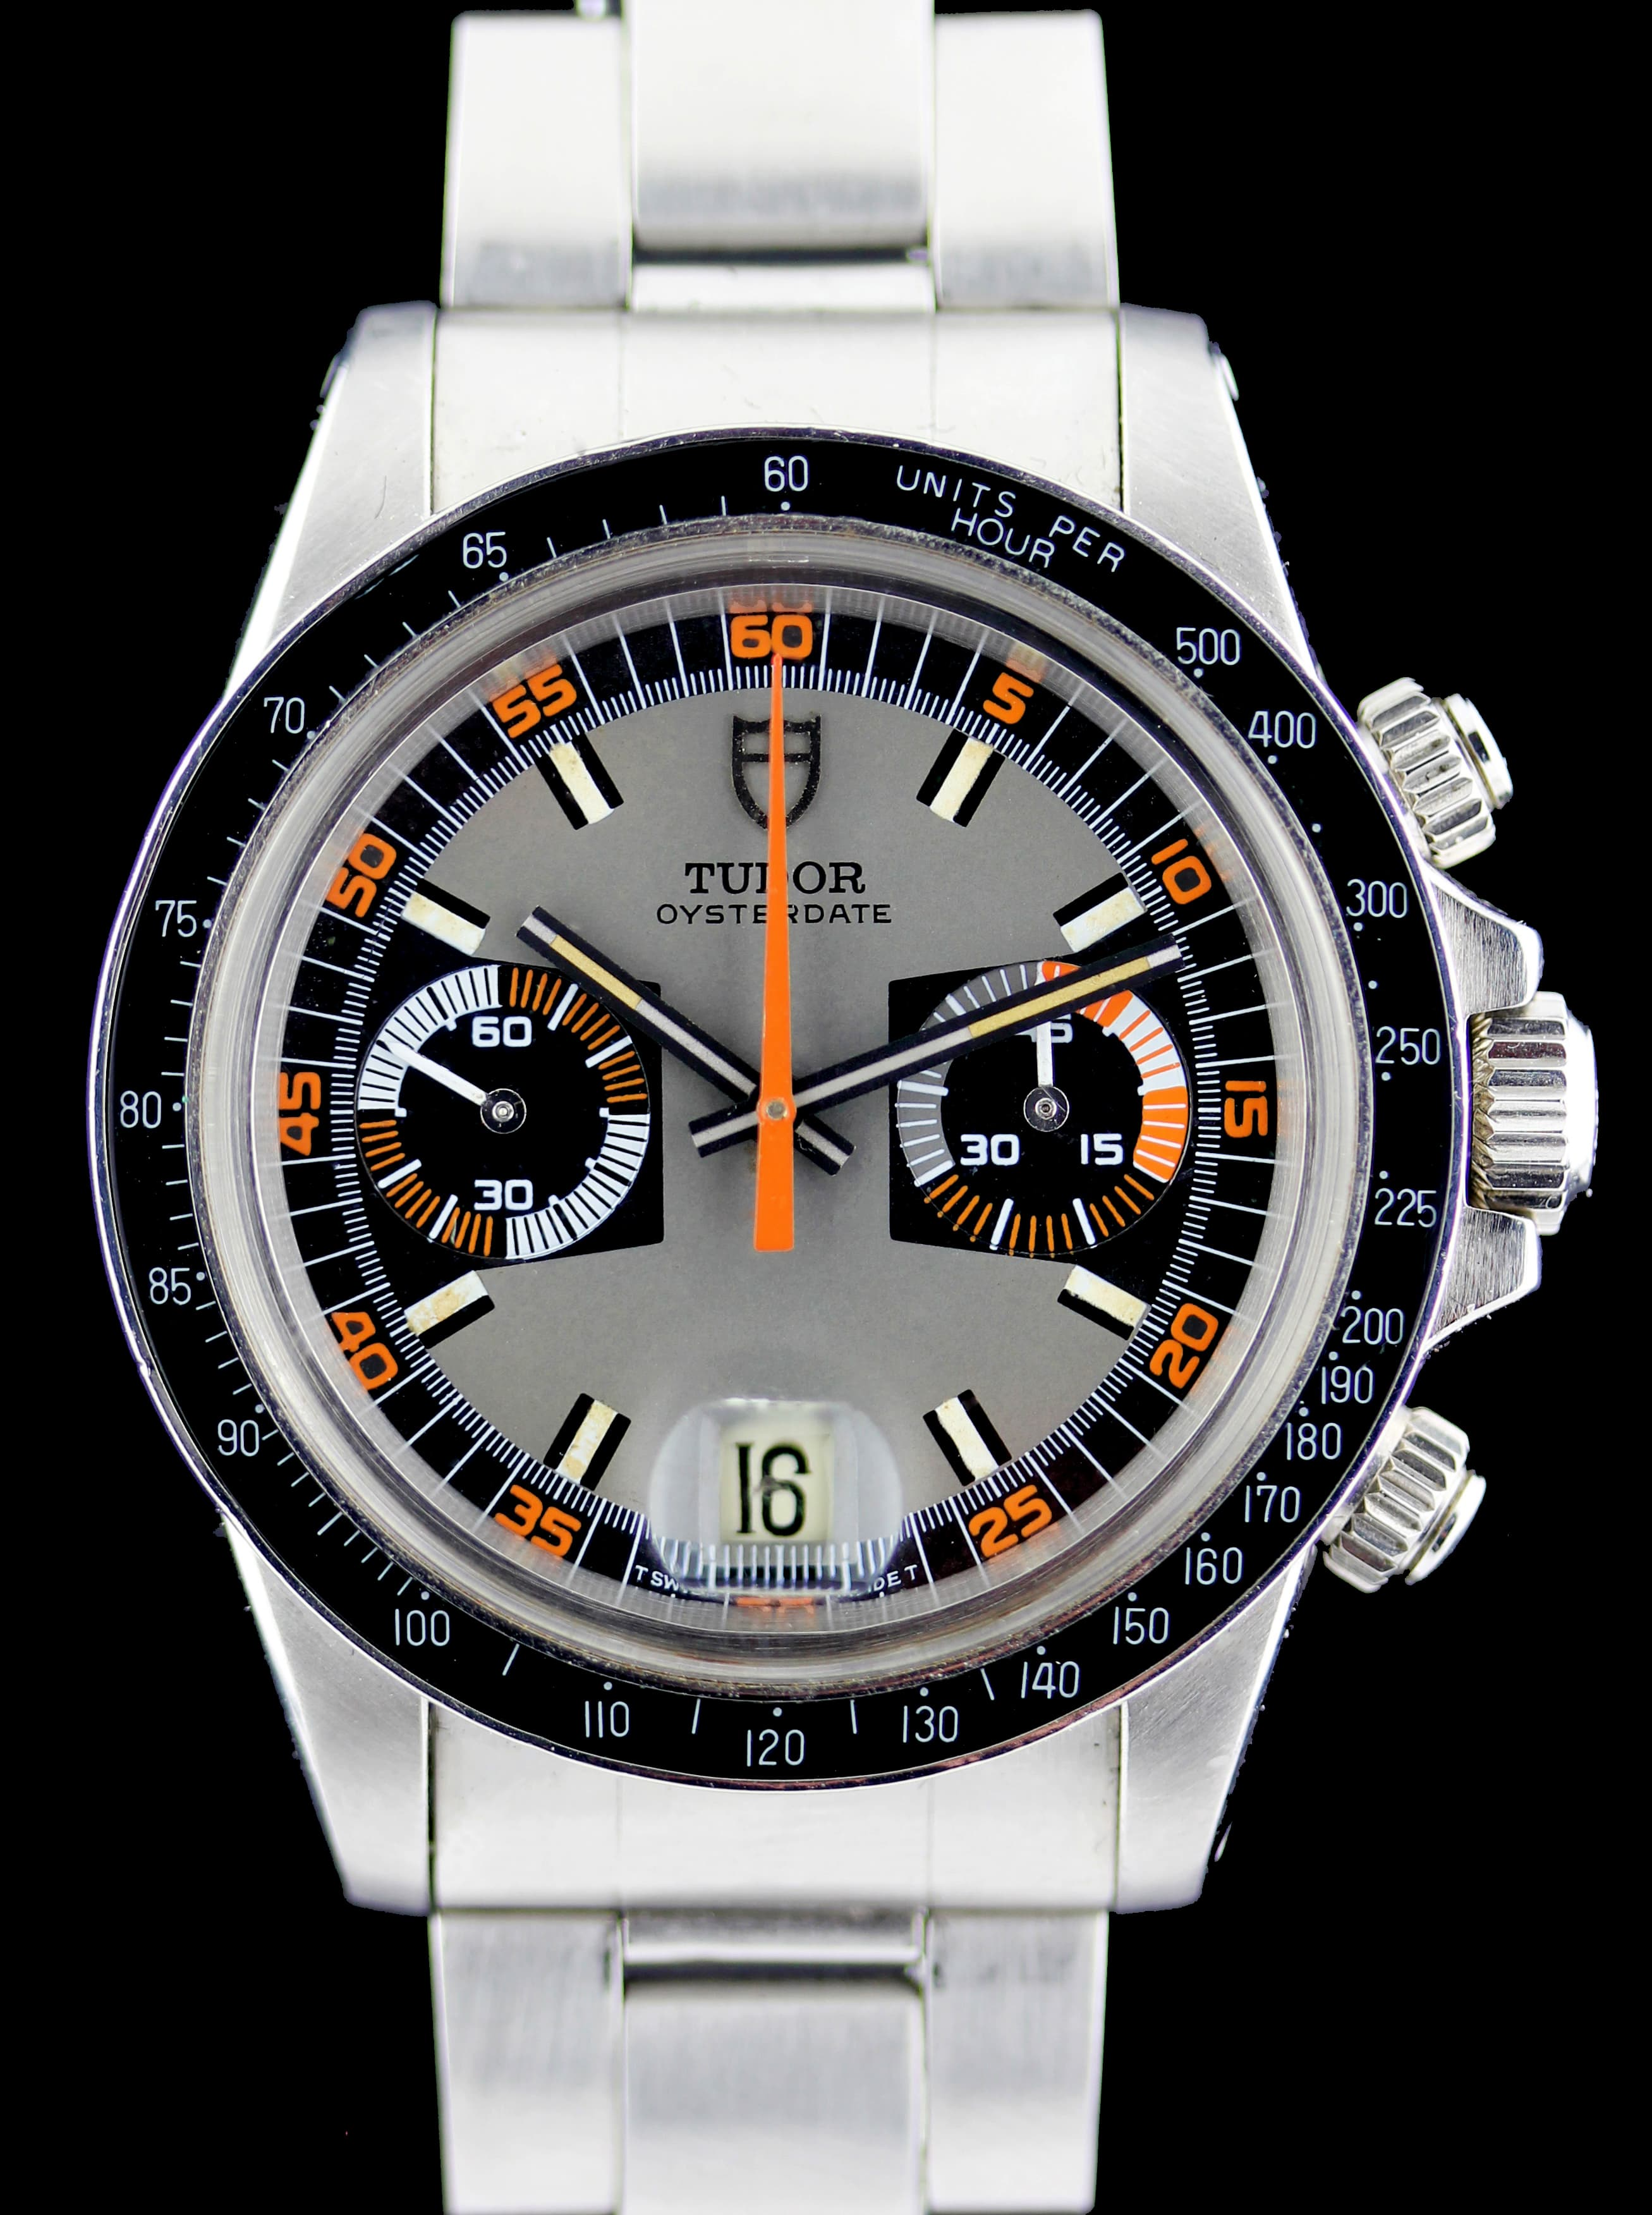 TUDOR Oysterdate chronograph ref. 7149